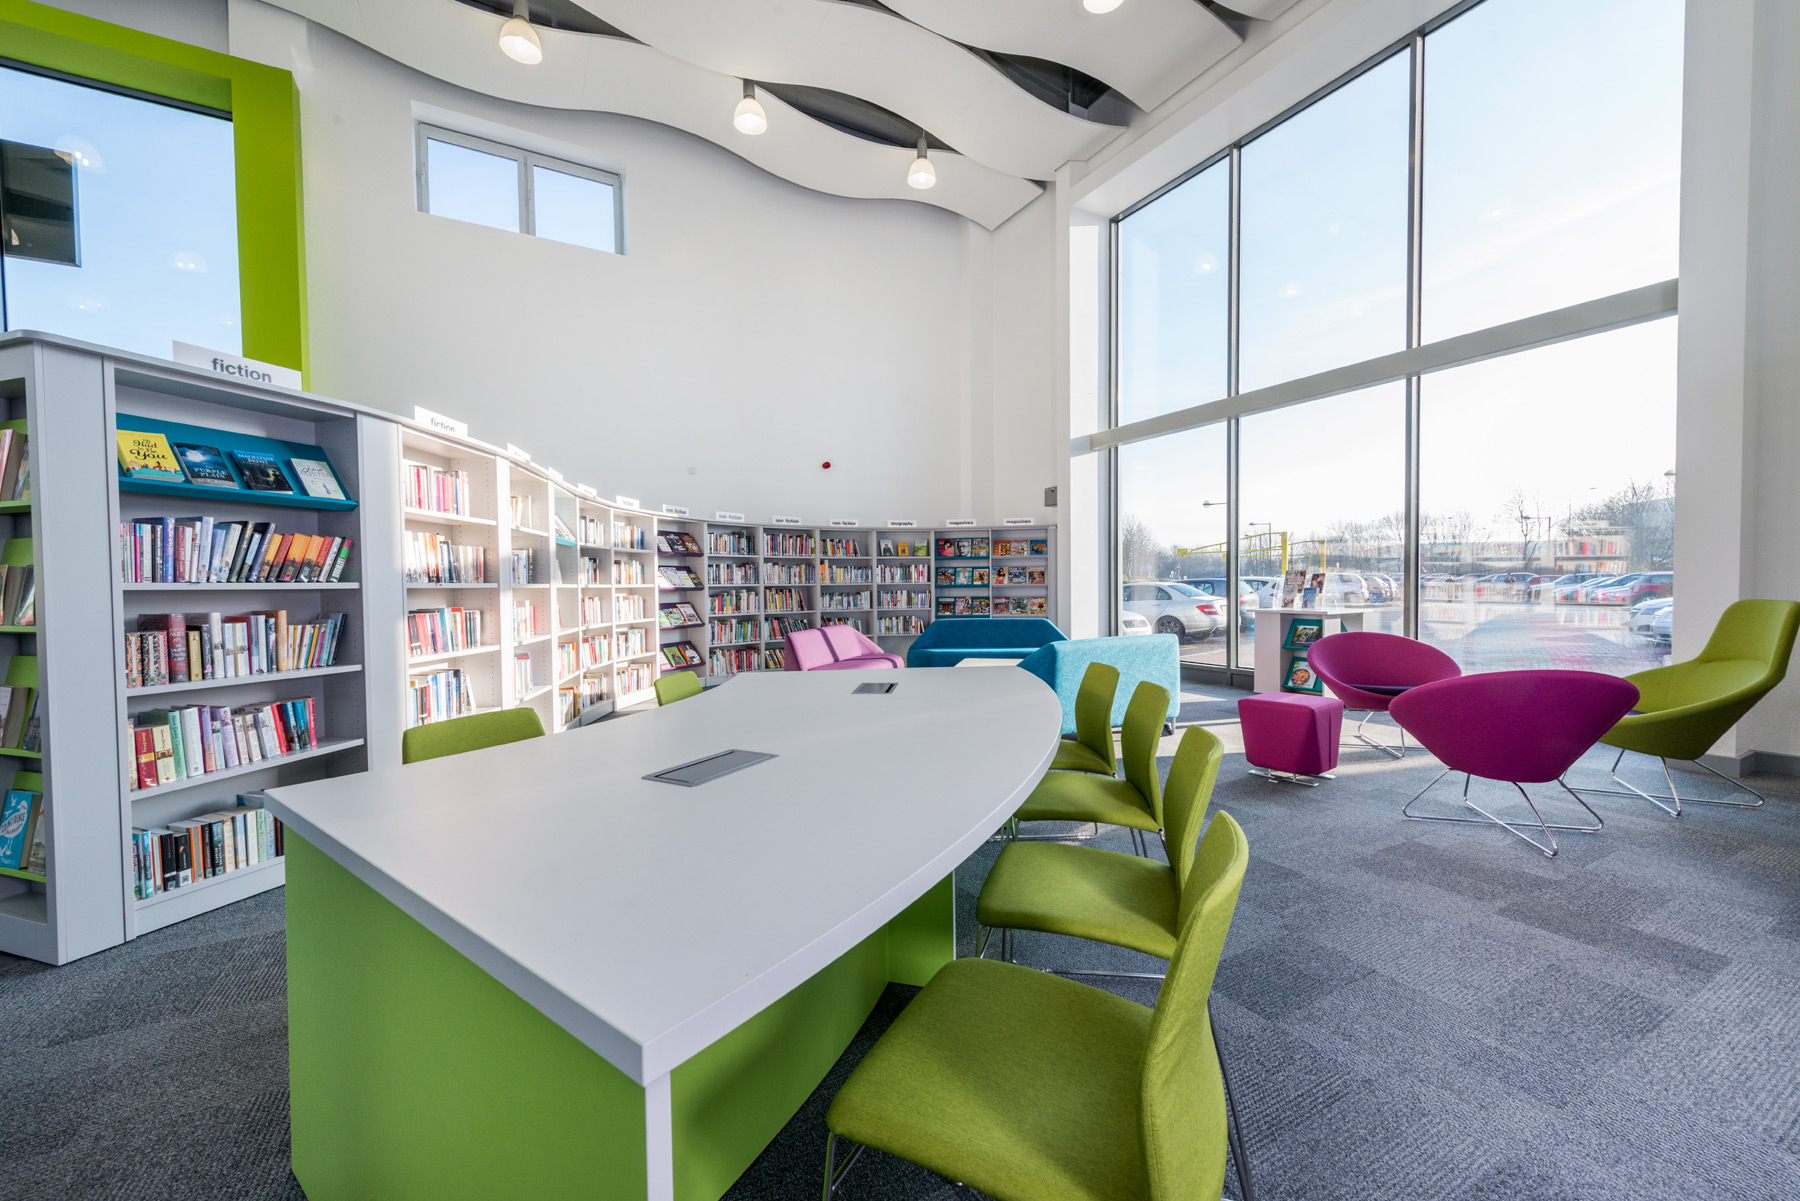 Kingston Library, Milton Keynes, UK